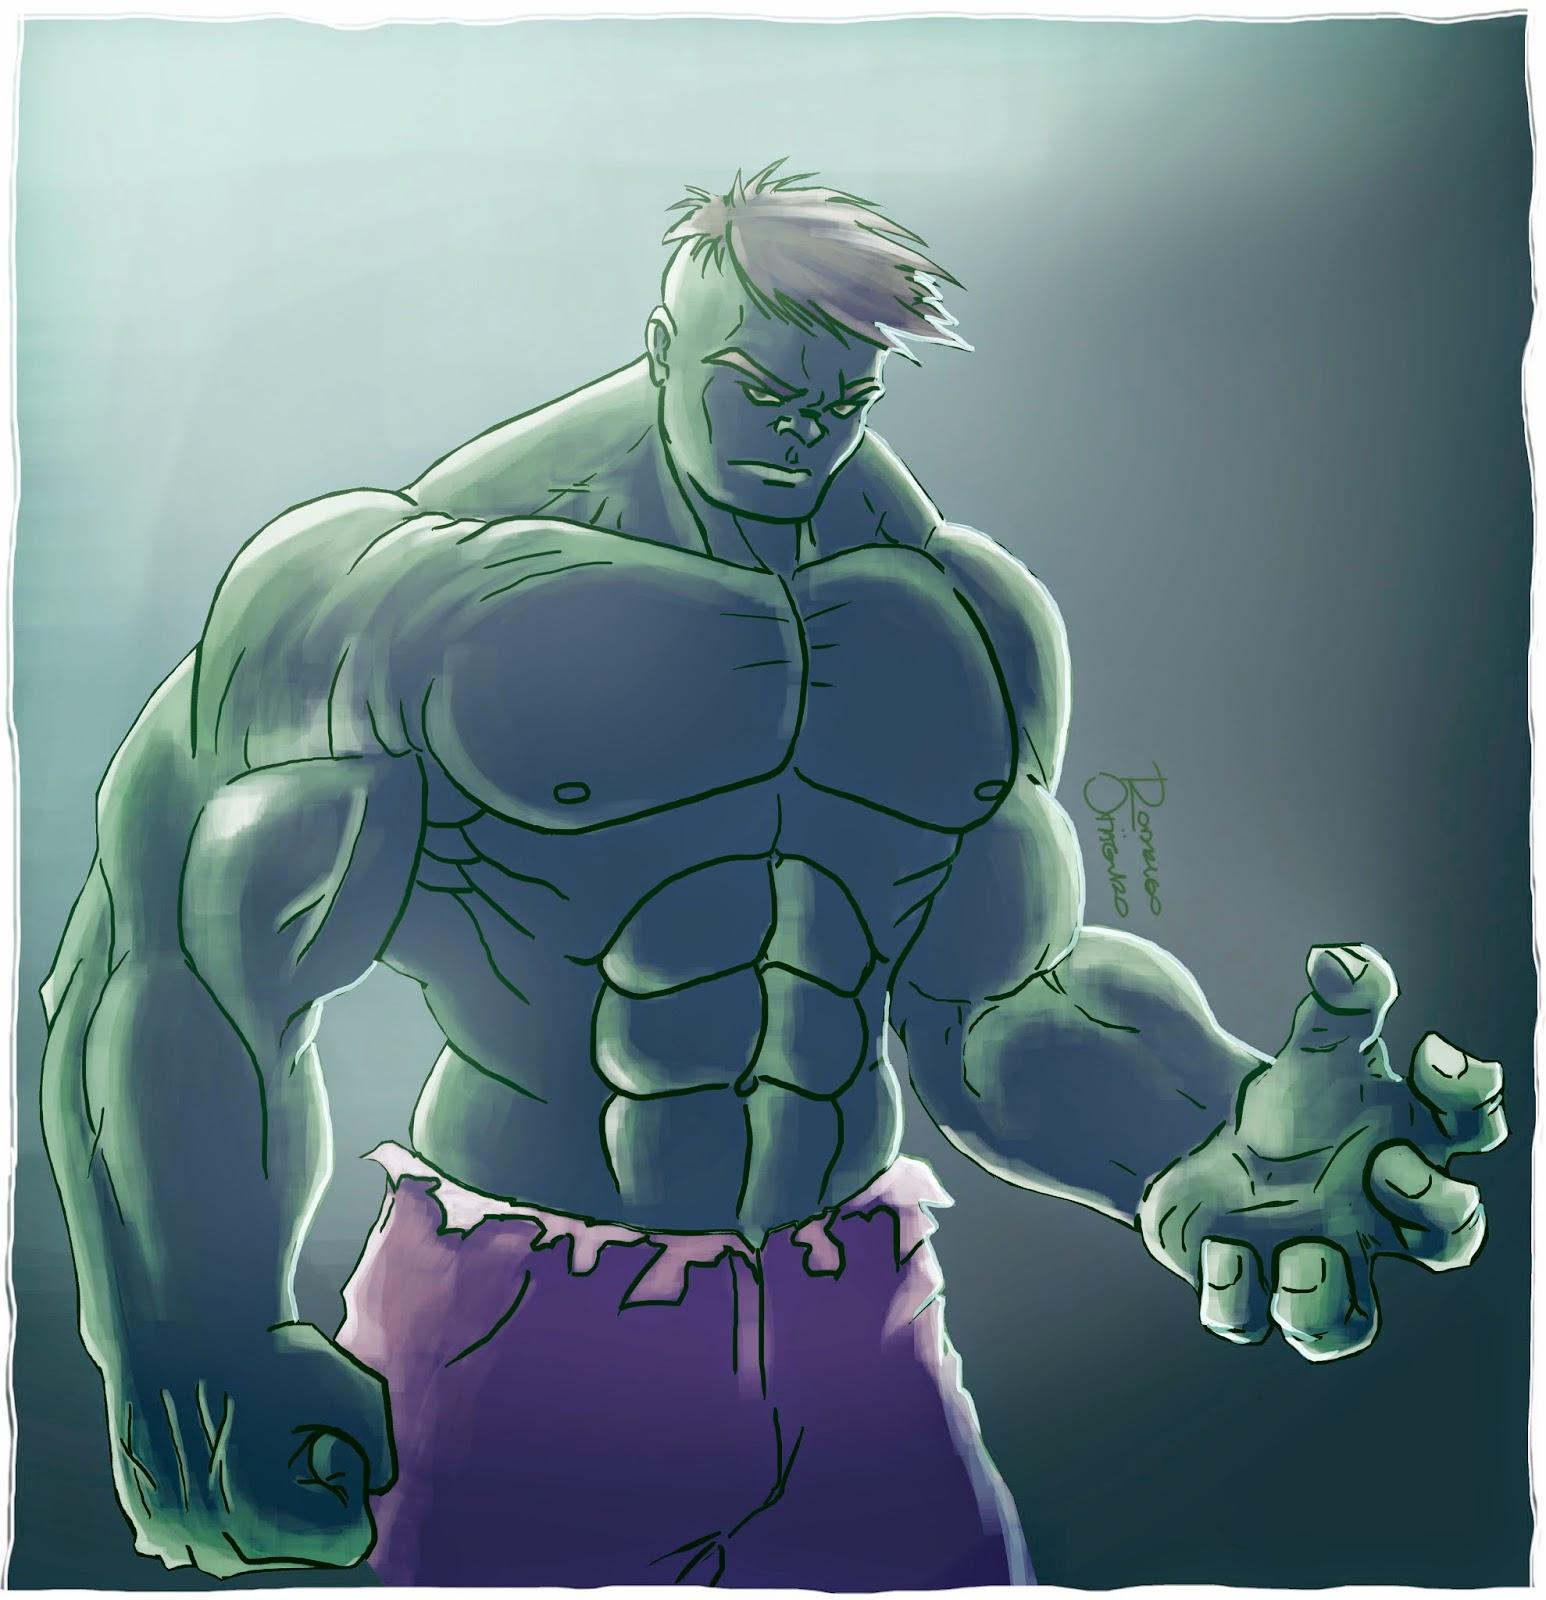 Incredible Hulk - Incrível Hulk